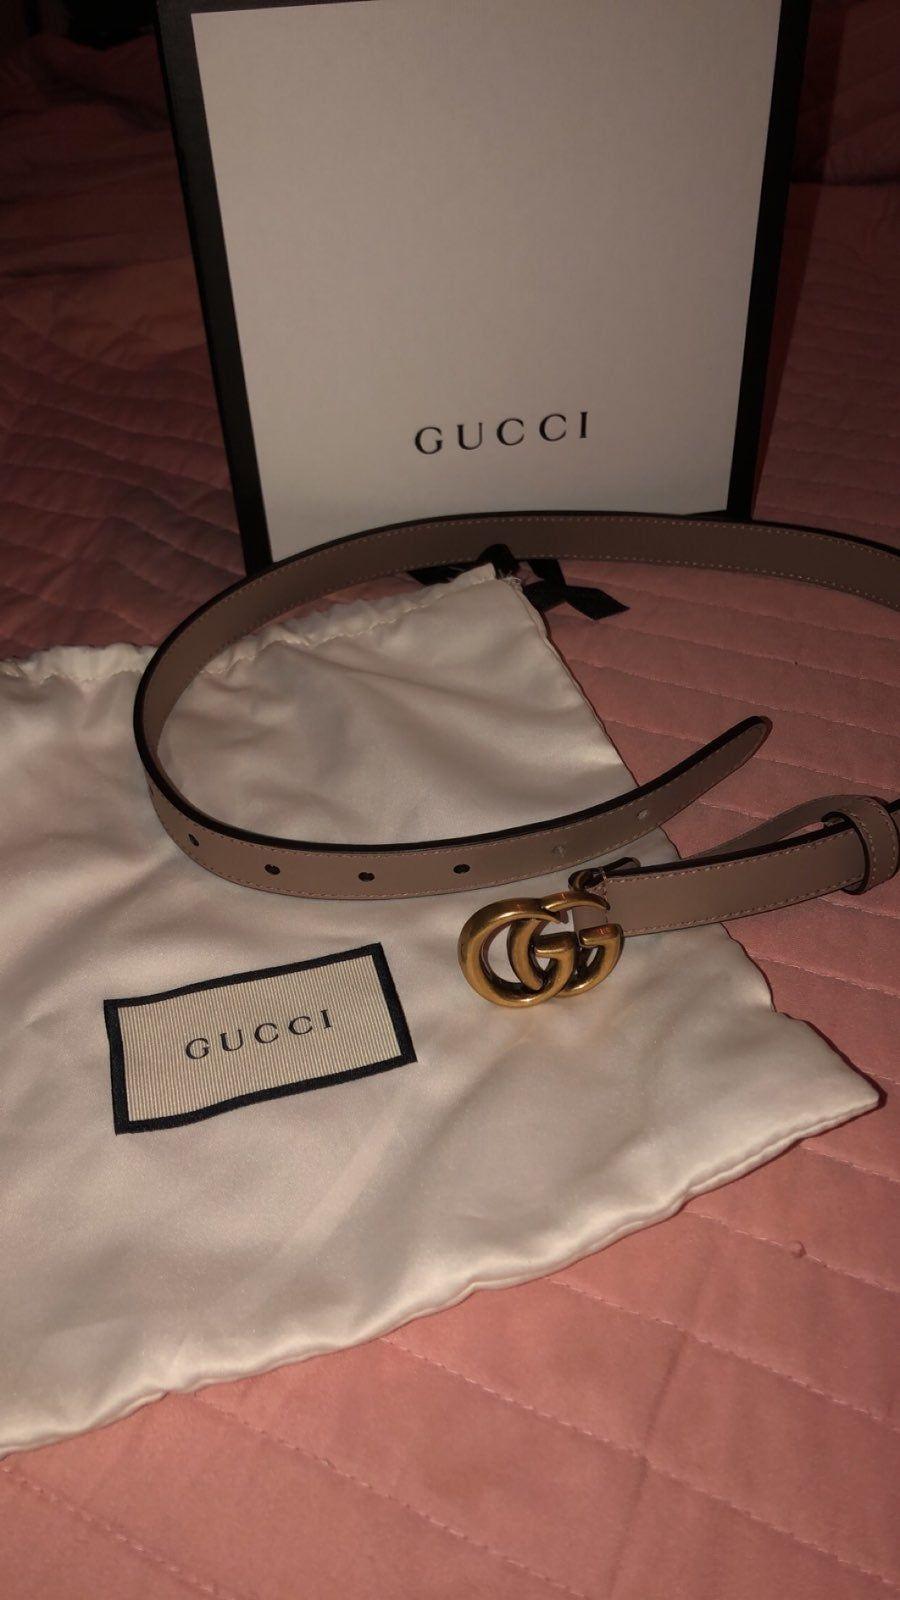 Tan/brown women\u0027s Gucci belt, worn once. Size 65. Perfect